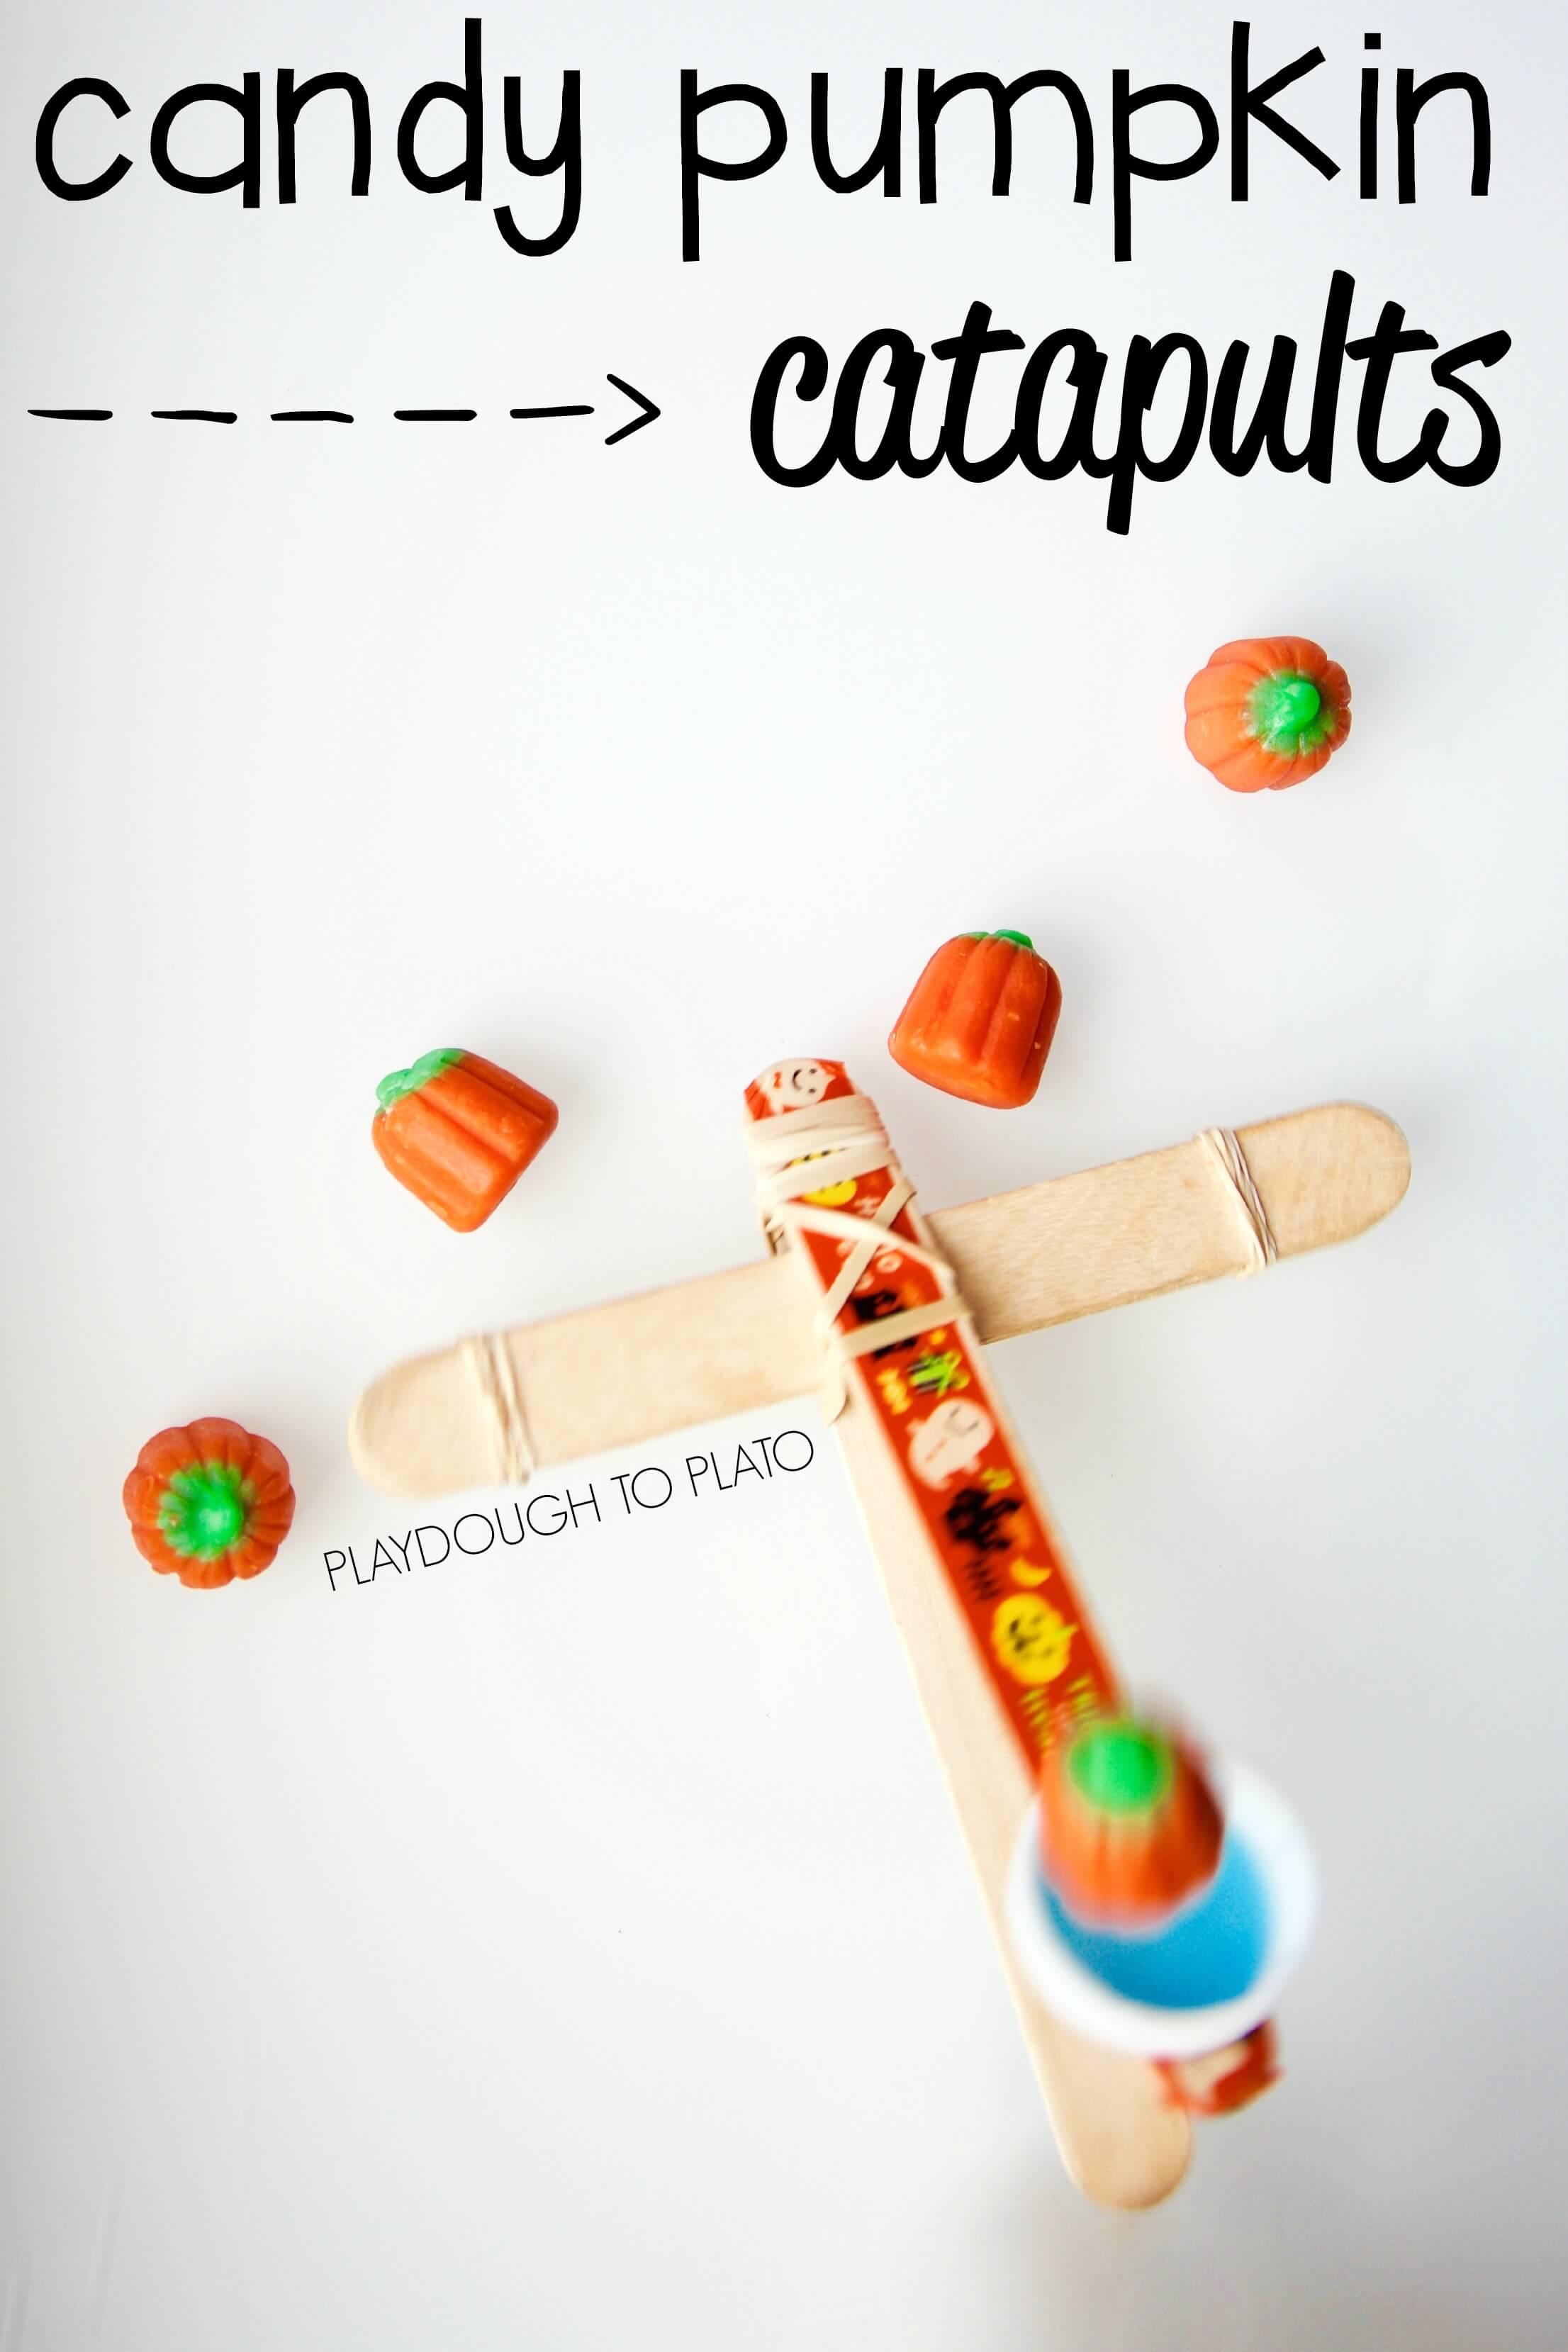 Pumpkin Catapults Playdough To Plato